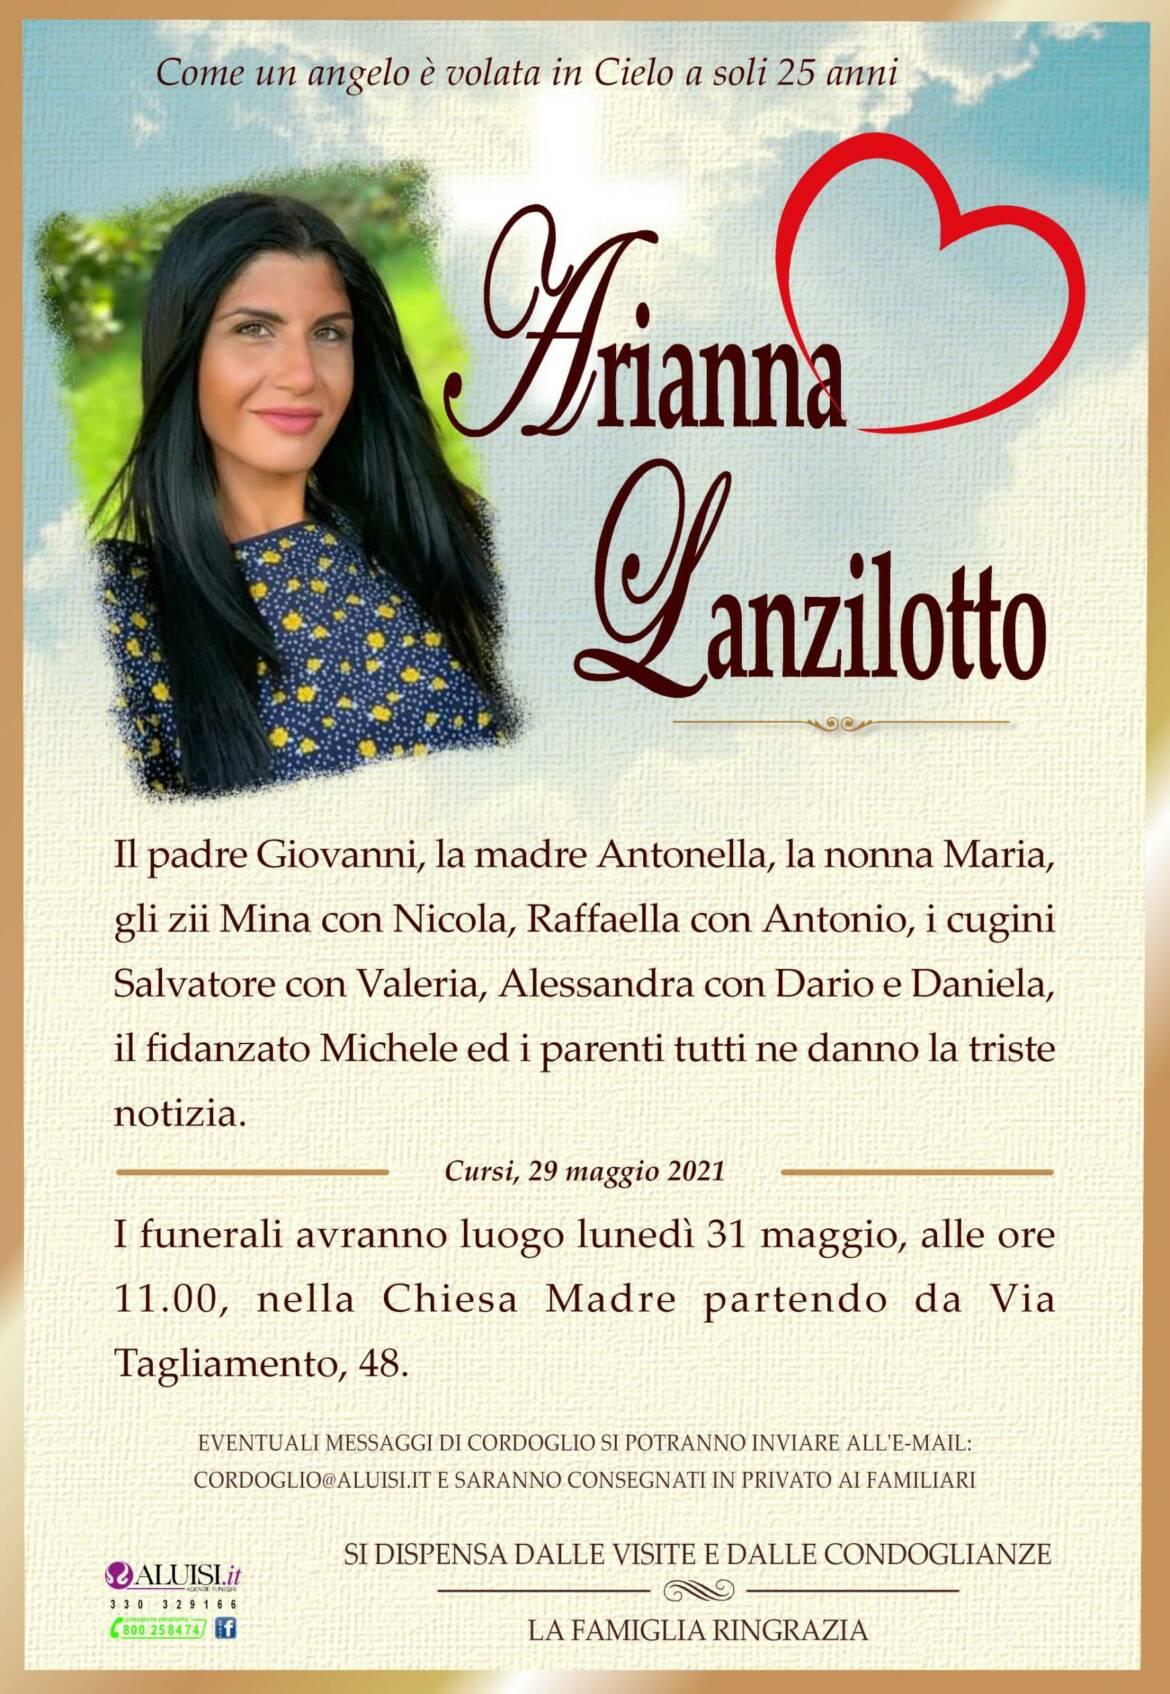 Annuncio-Arianna-Lanzilotto-Cursi-1-1-scaled.jpg